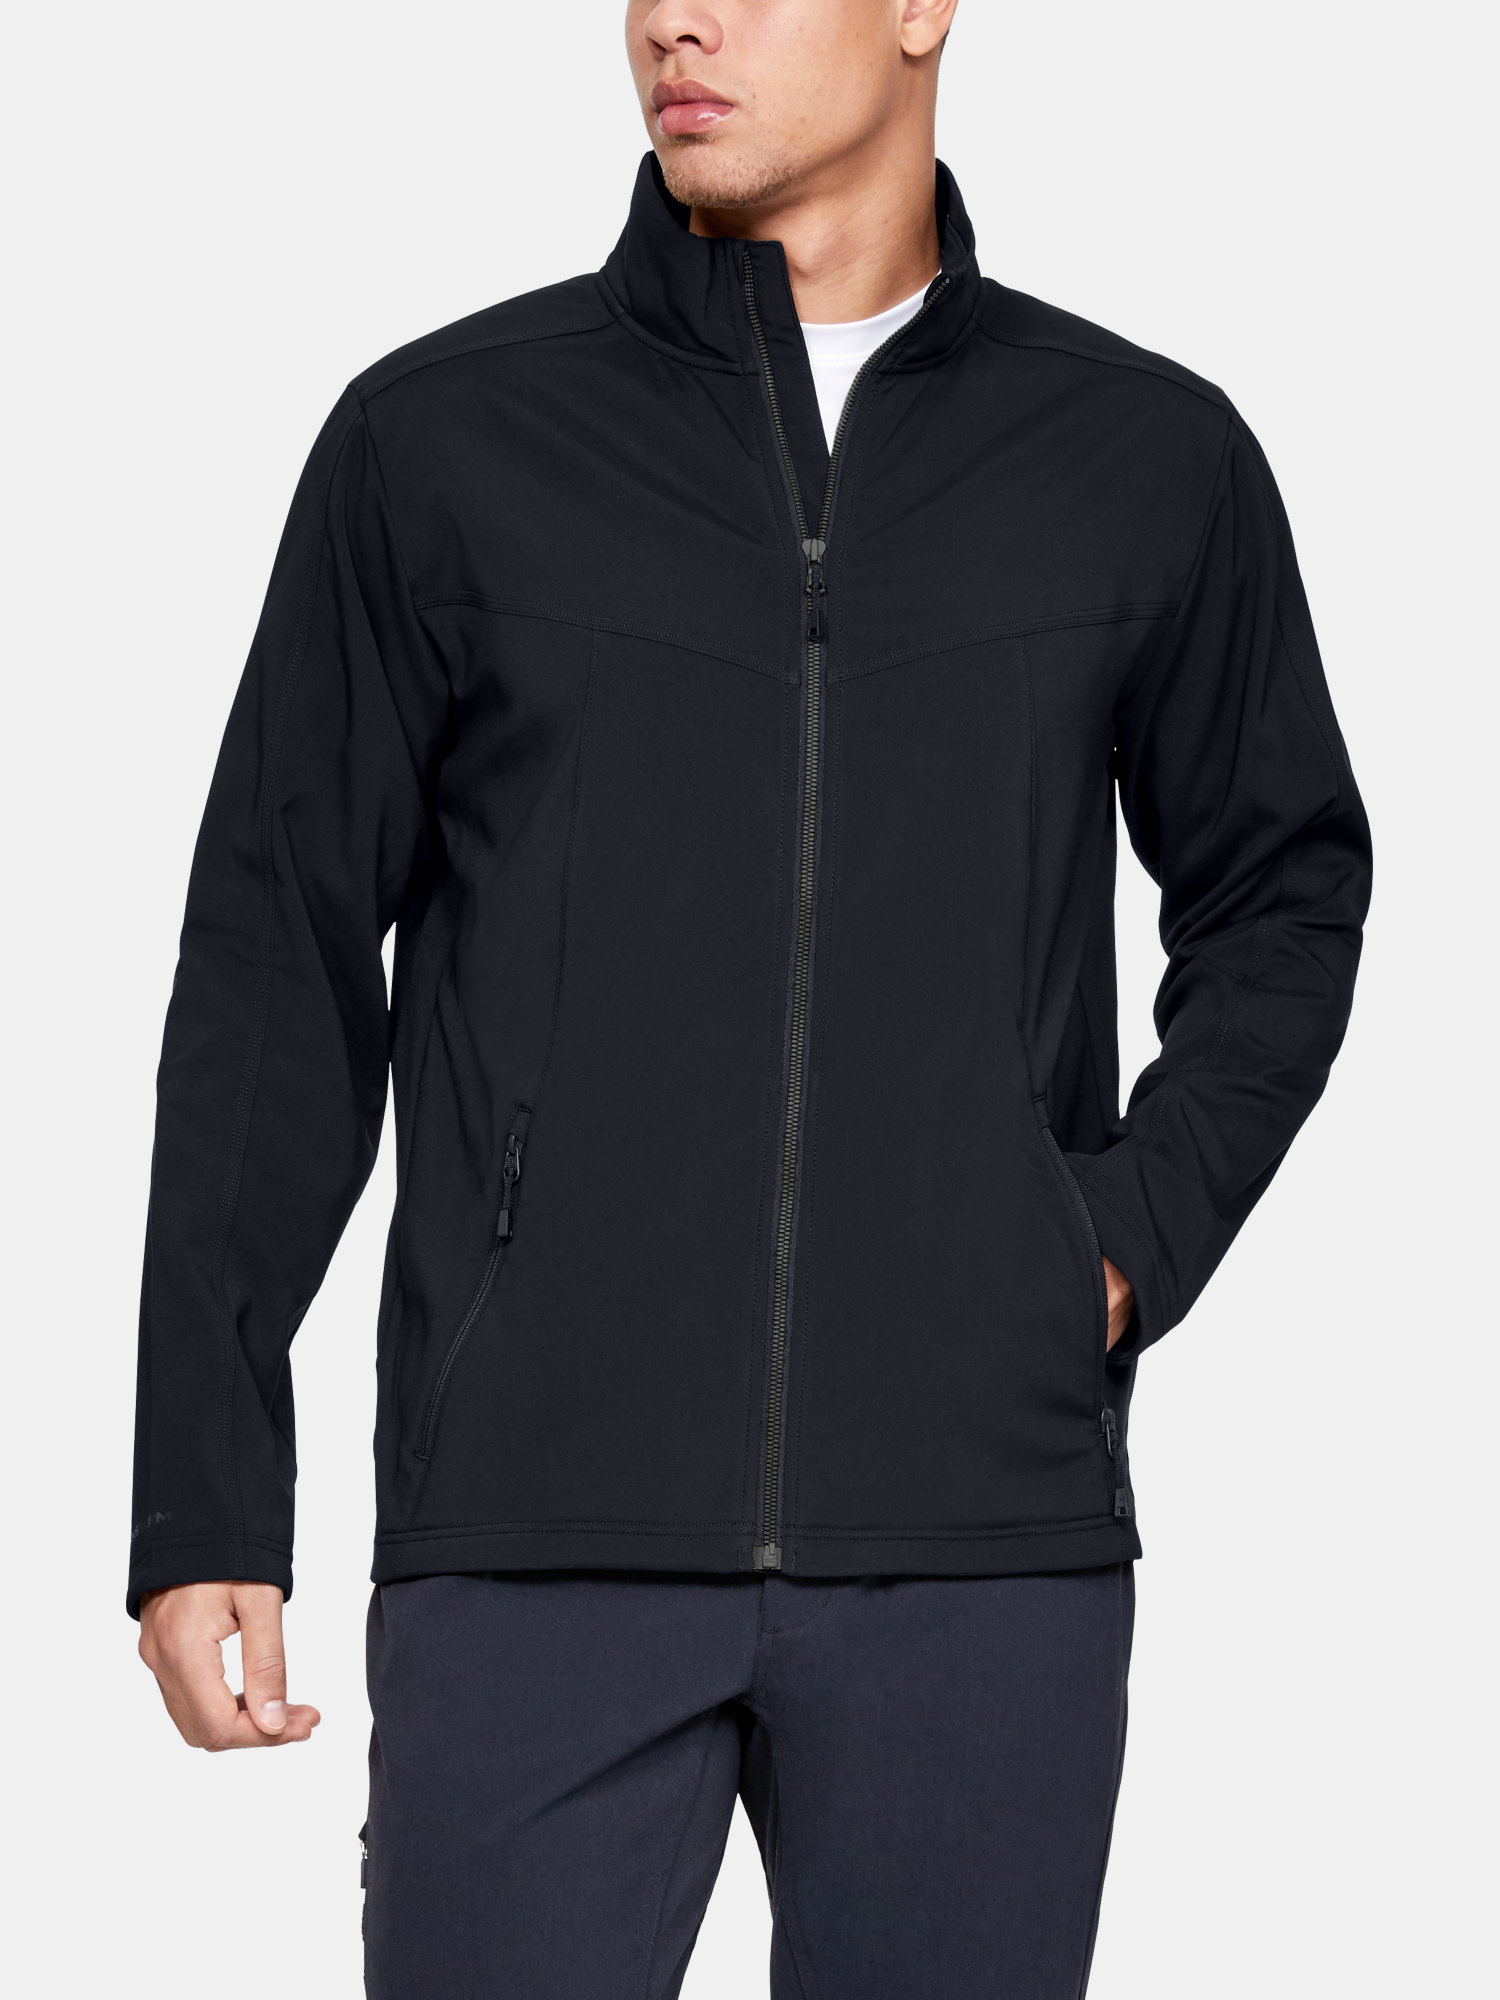 UA New Tac All Season Jacket-BLK